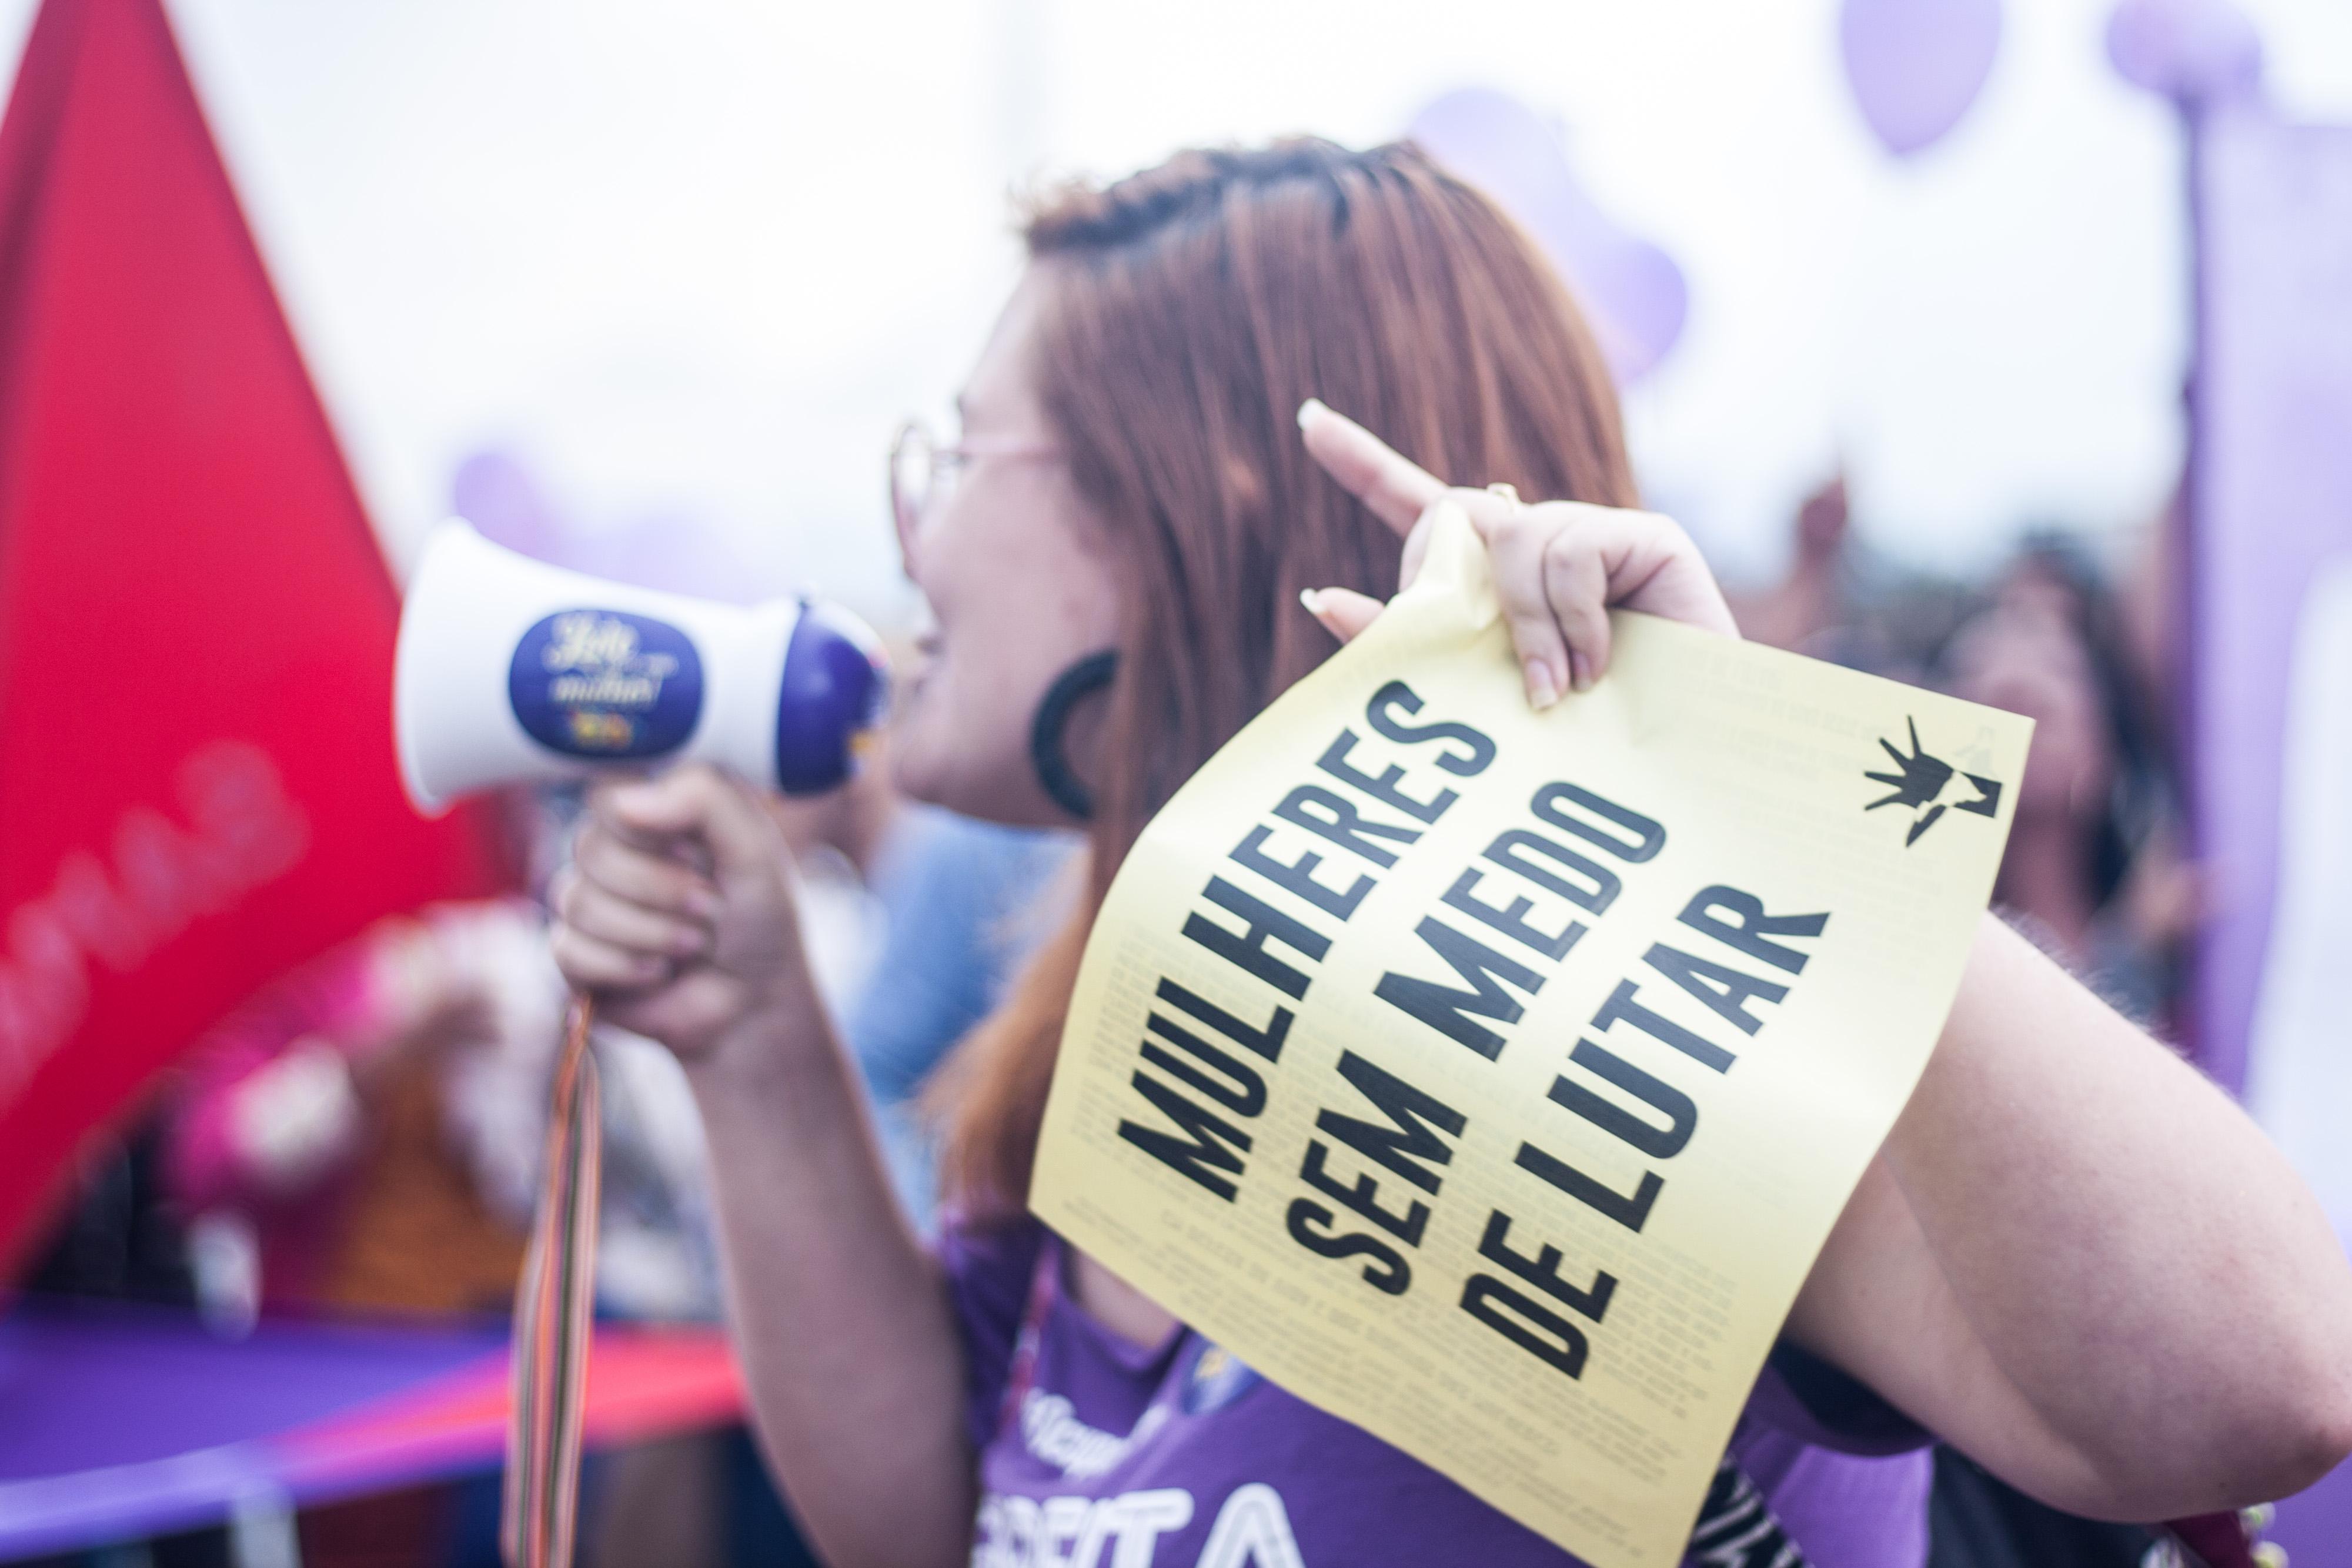 Dia Internacional de Luta das Mulheres #8M - 08/03/2018 - Brasília (DF)